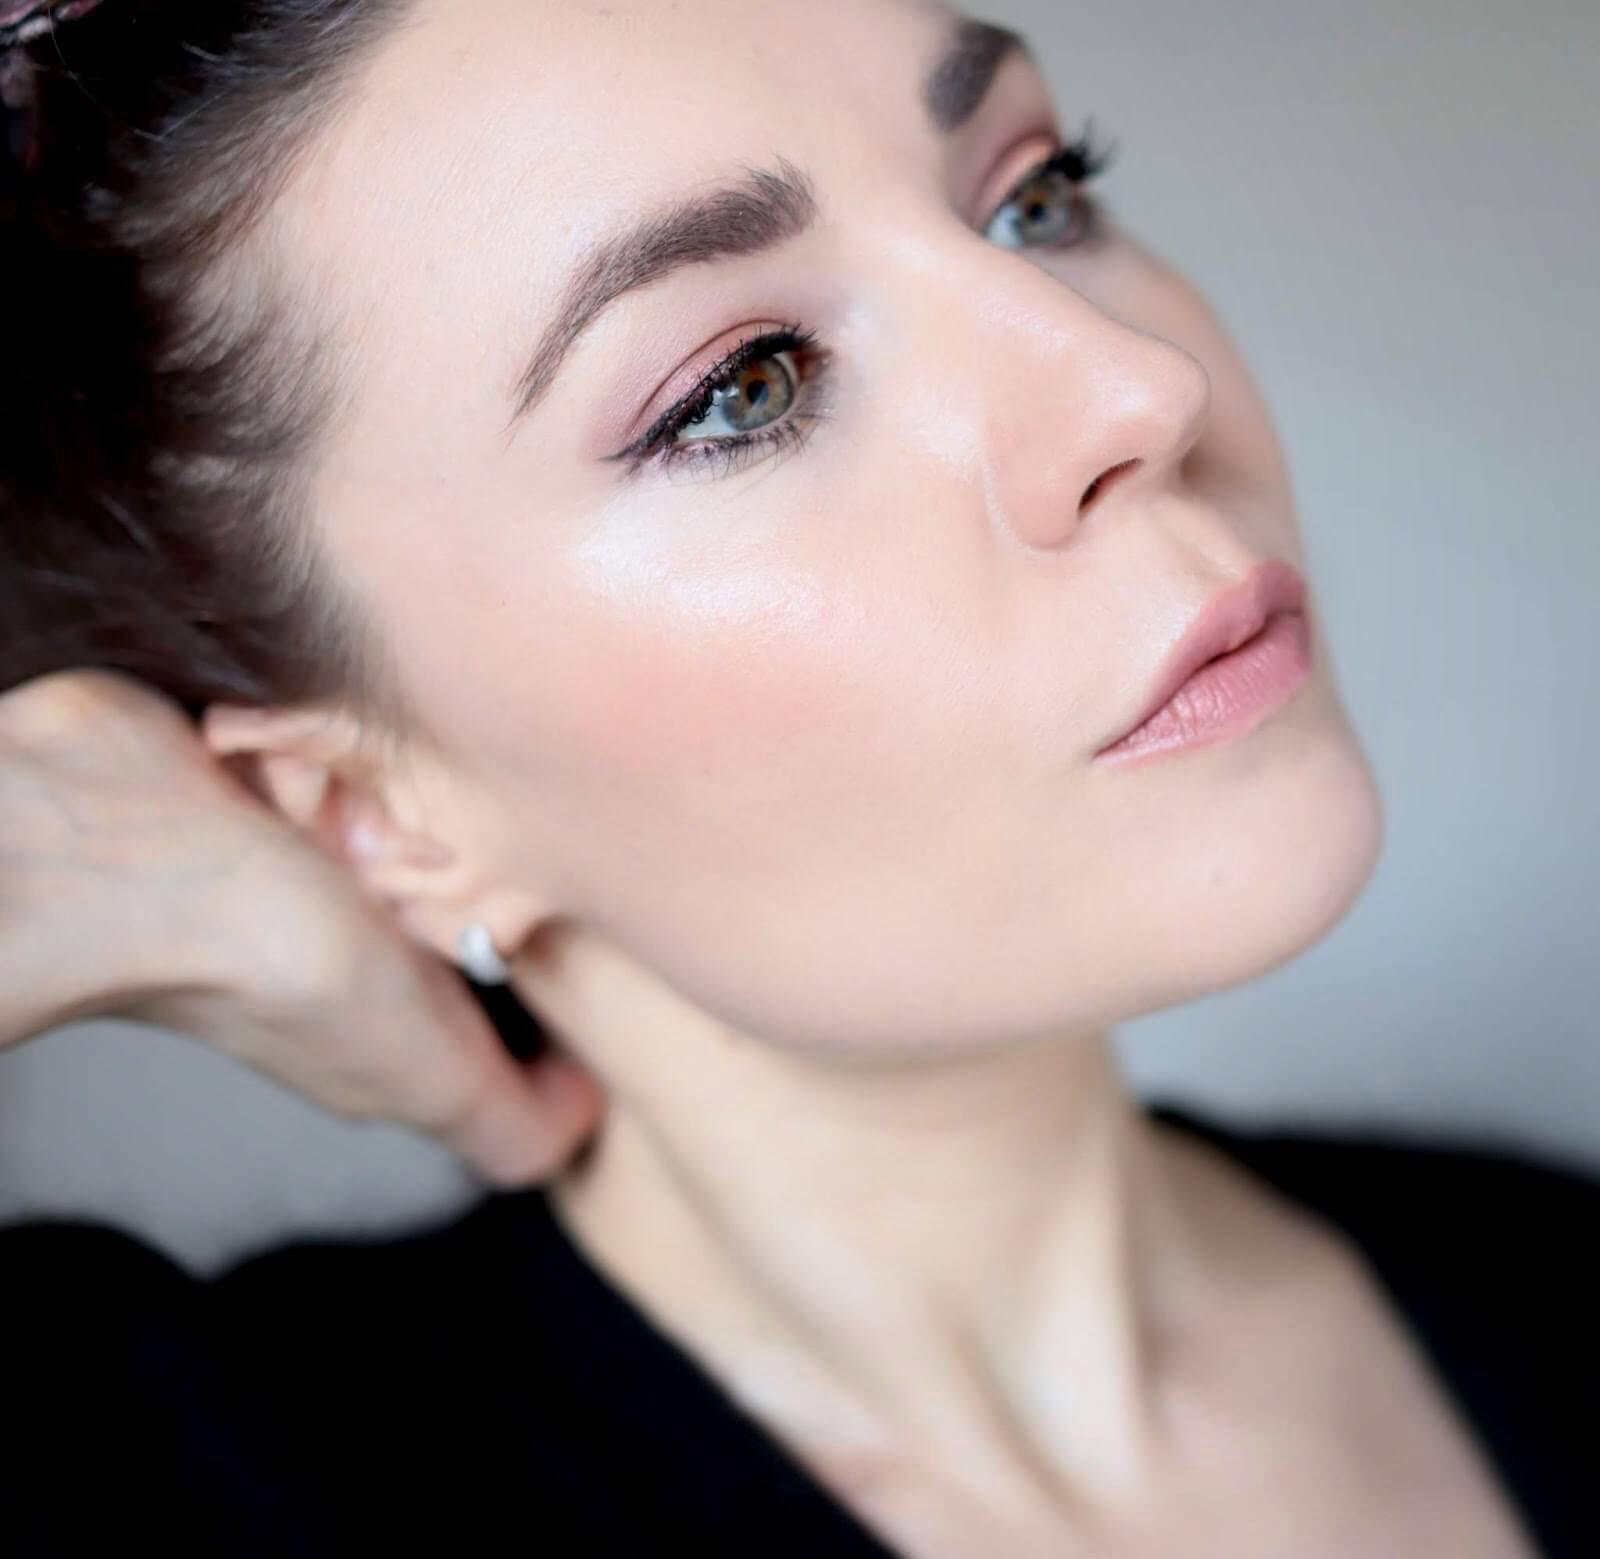 shiseido maquillage avis revue